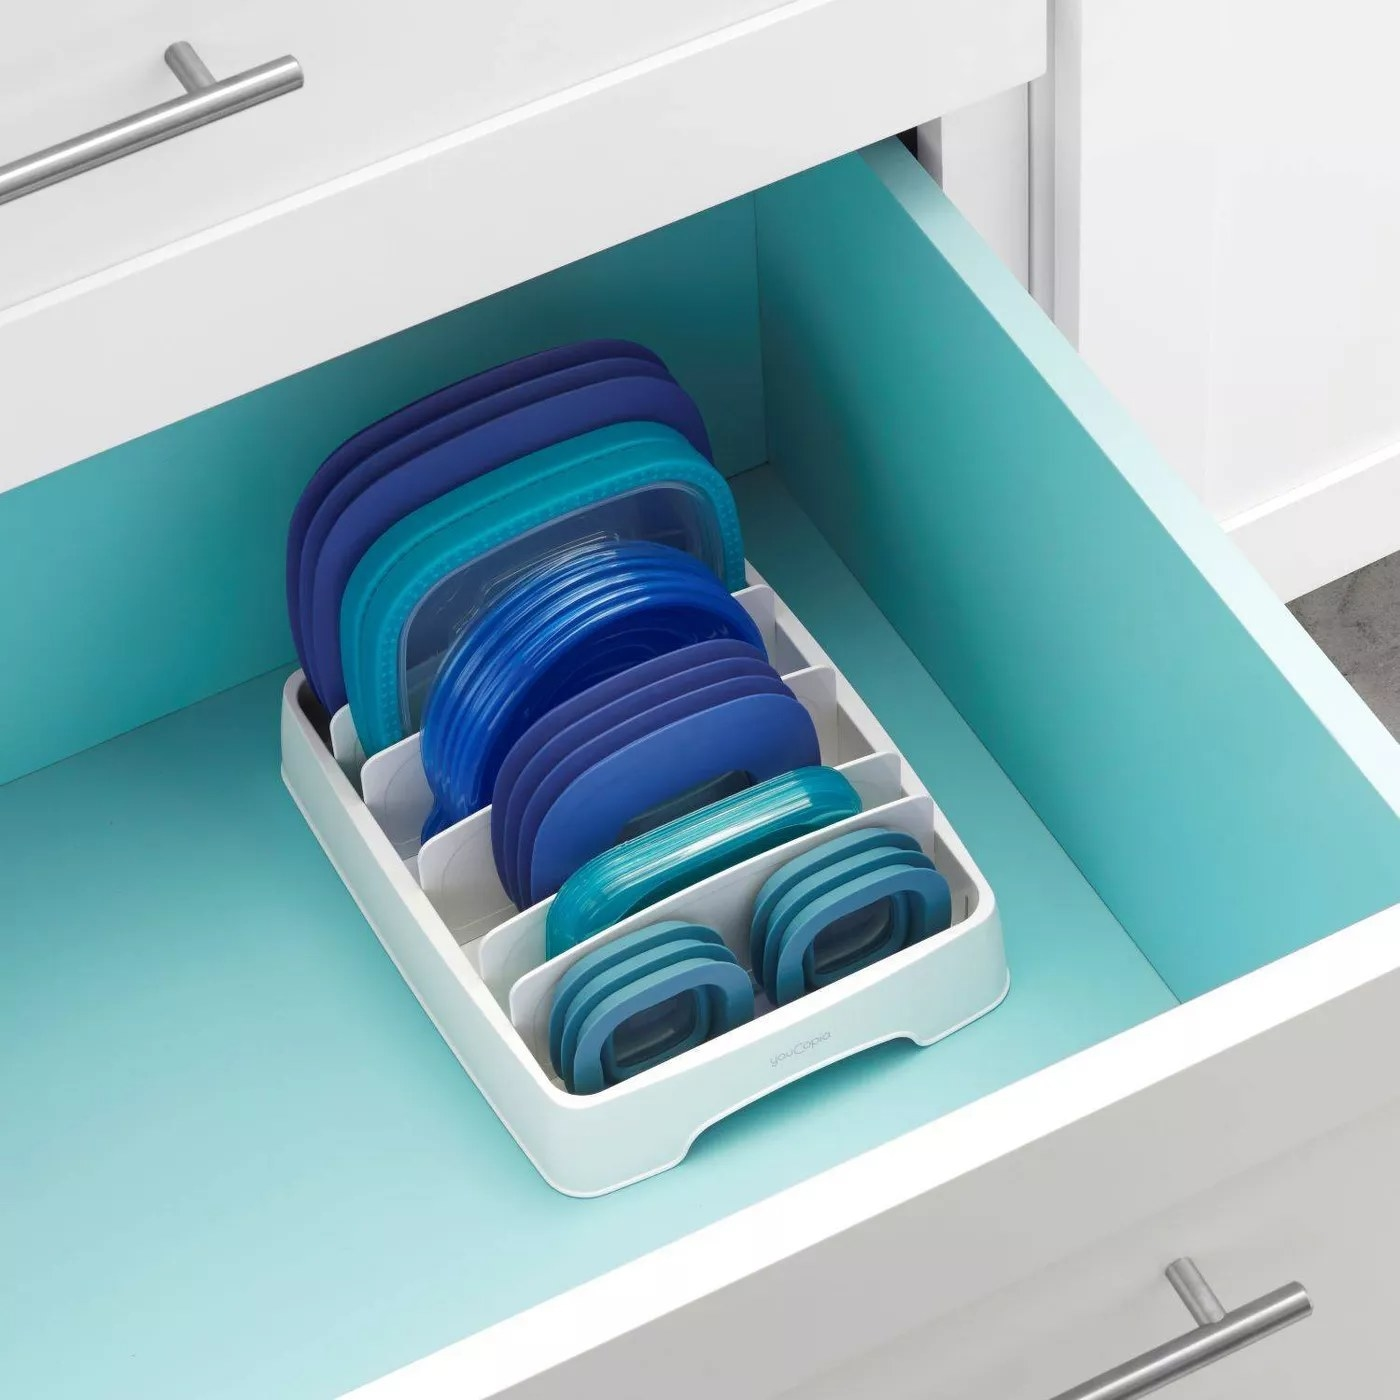 A lid storage